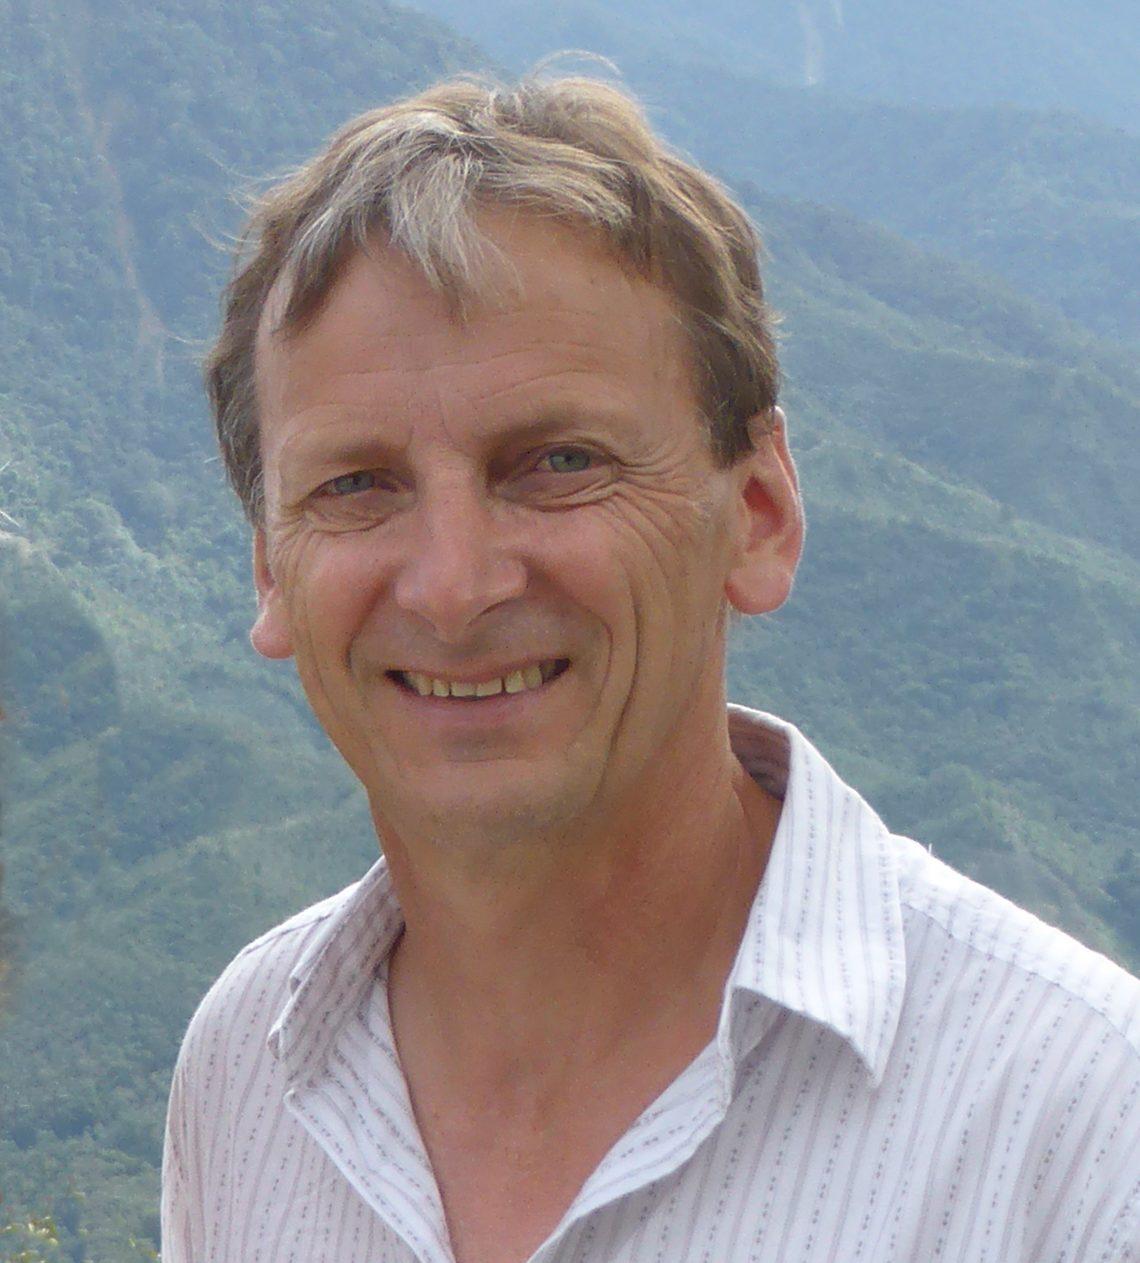 Gavin Rees